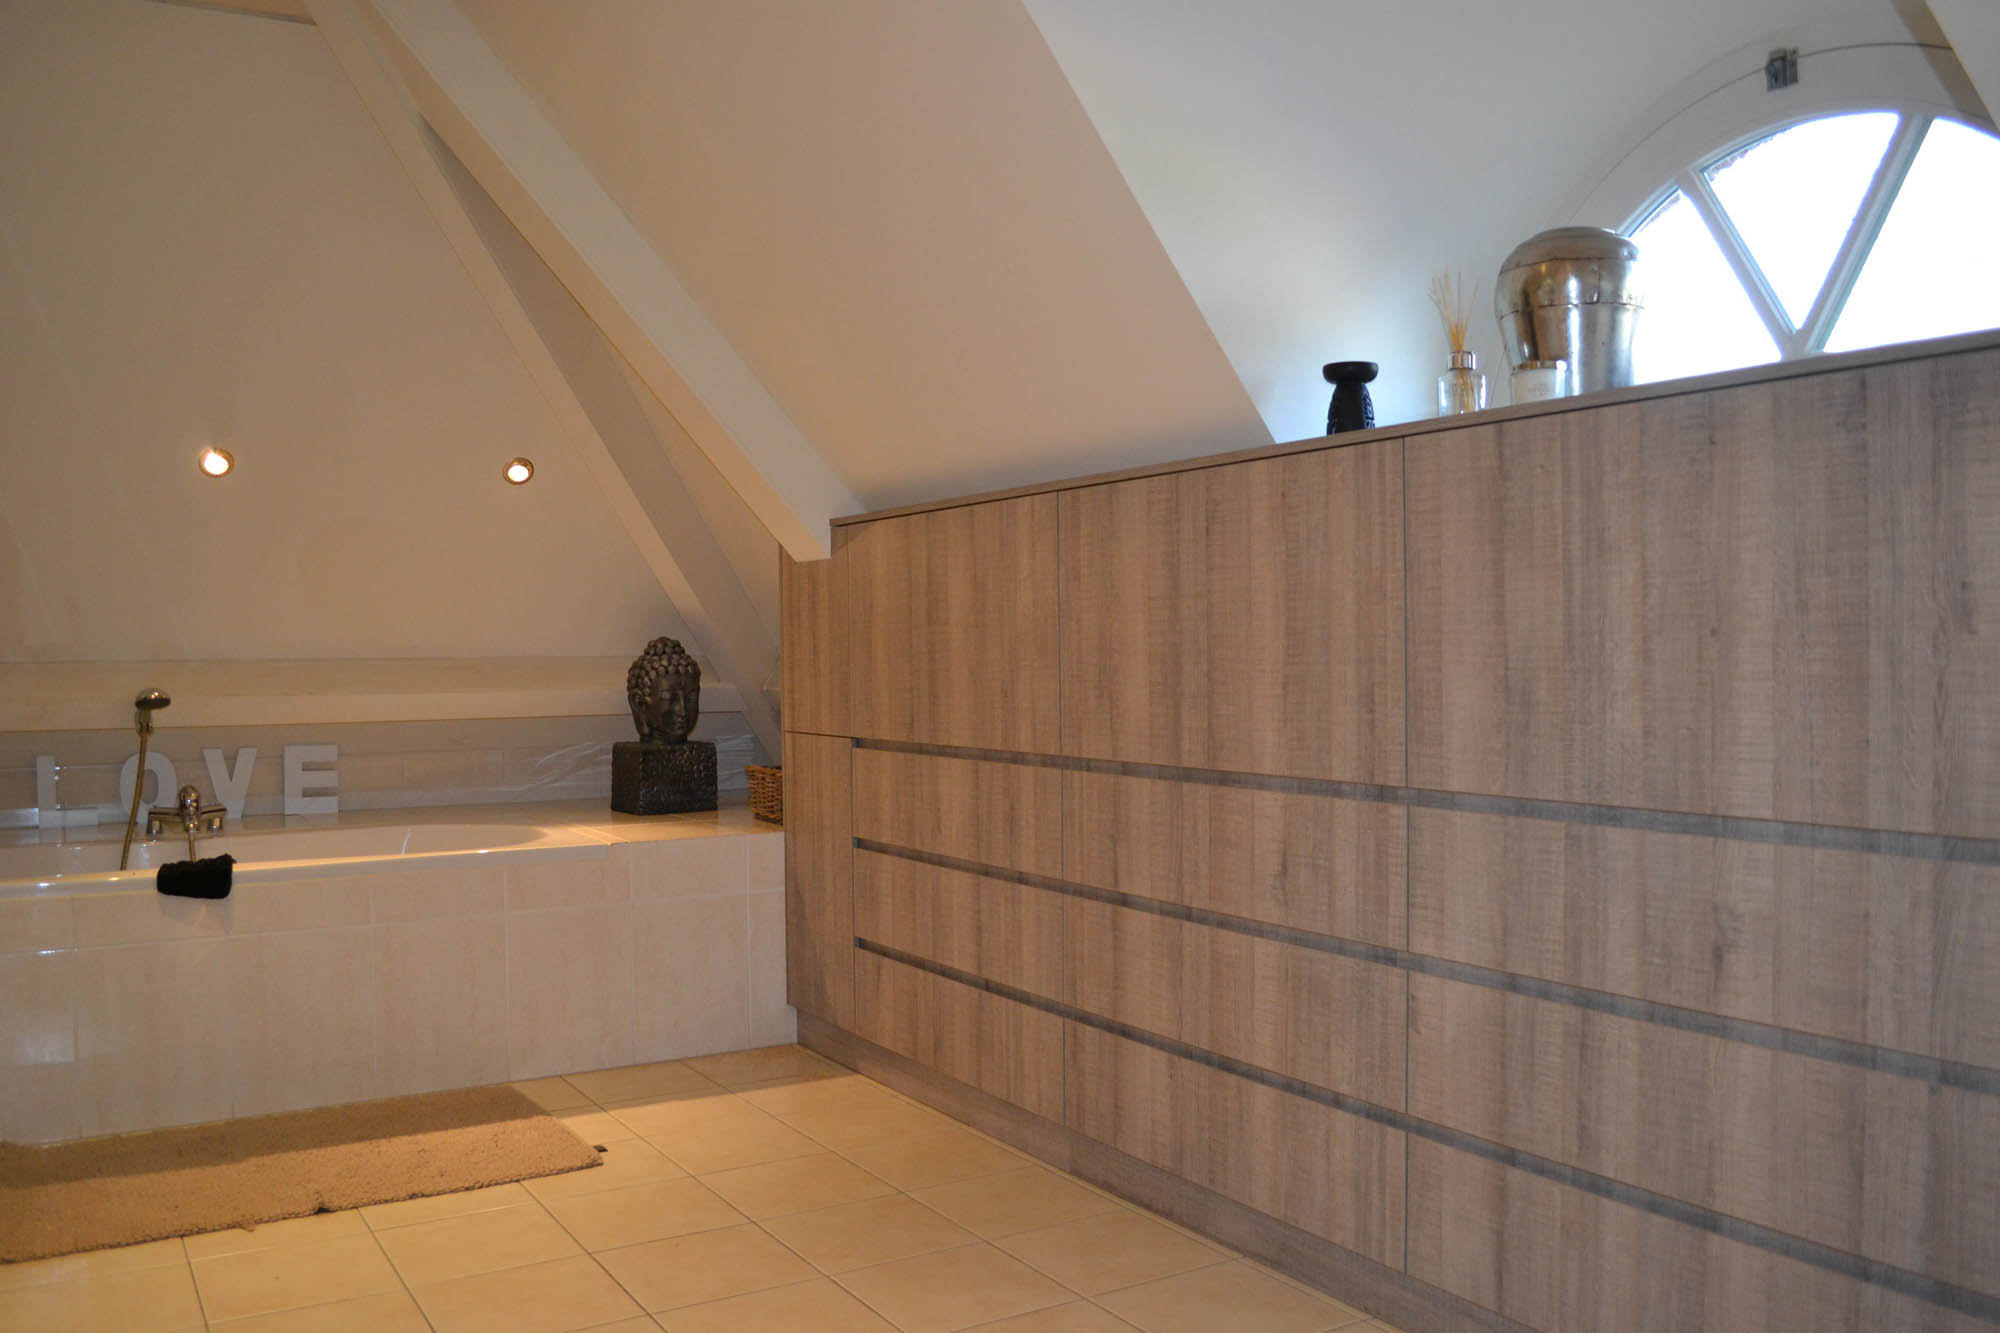 badkamer badkamermeubel onder schuine kap pdi interieurbouw